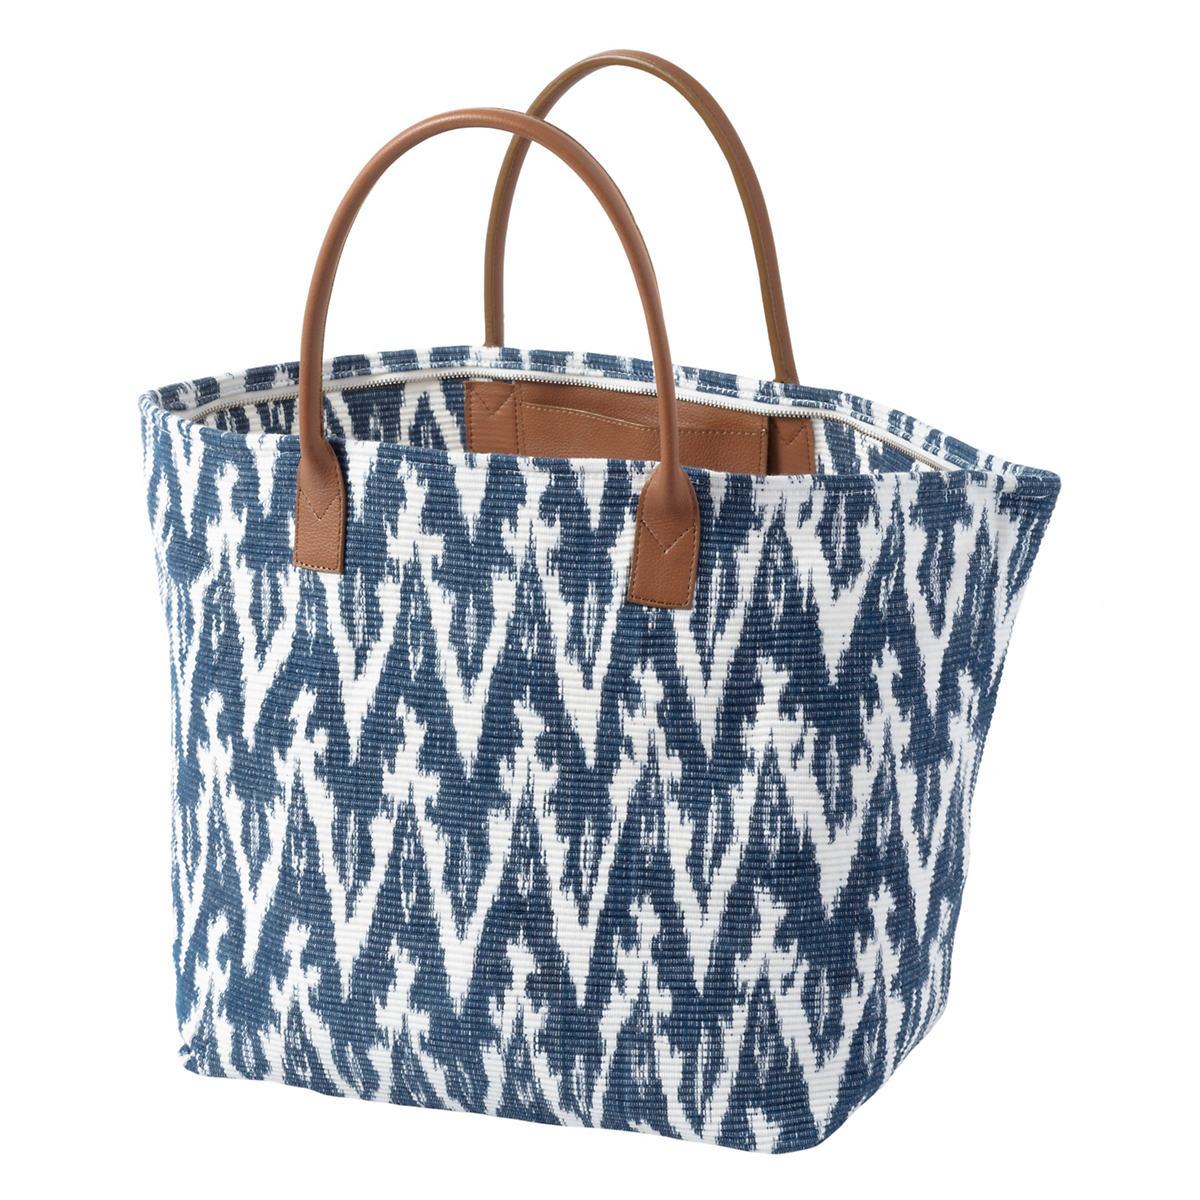 Ikat Woven Indigo Tote Bag